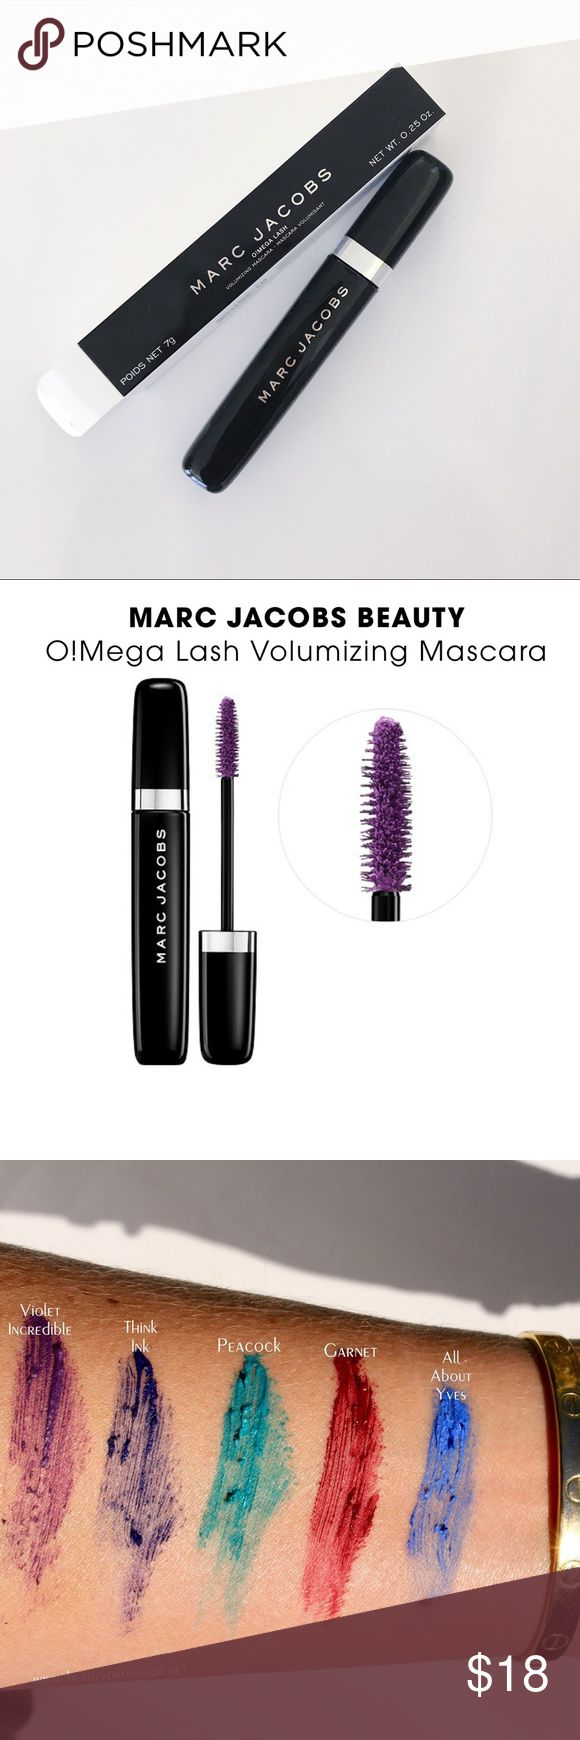 Marc Jacobs O!Mega Mascara in Violet Incredible Brand new never used Marc Jacobs O!Mega Lash Volume Mascara in Violet Incredible. Super pretty!! Marc Jacobs Makeup Mascara